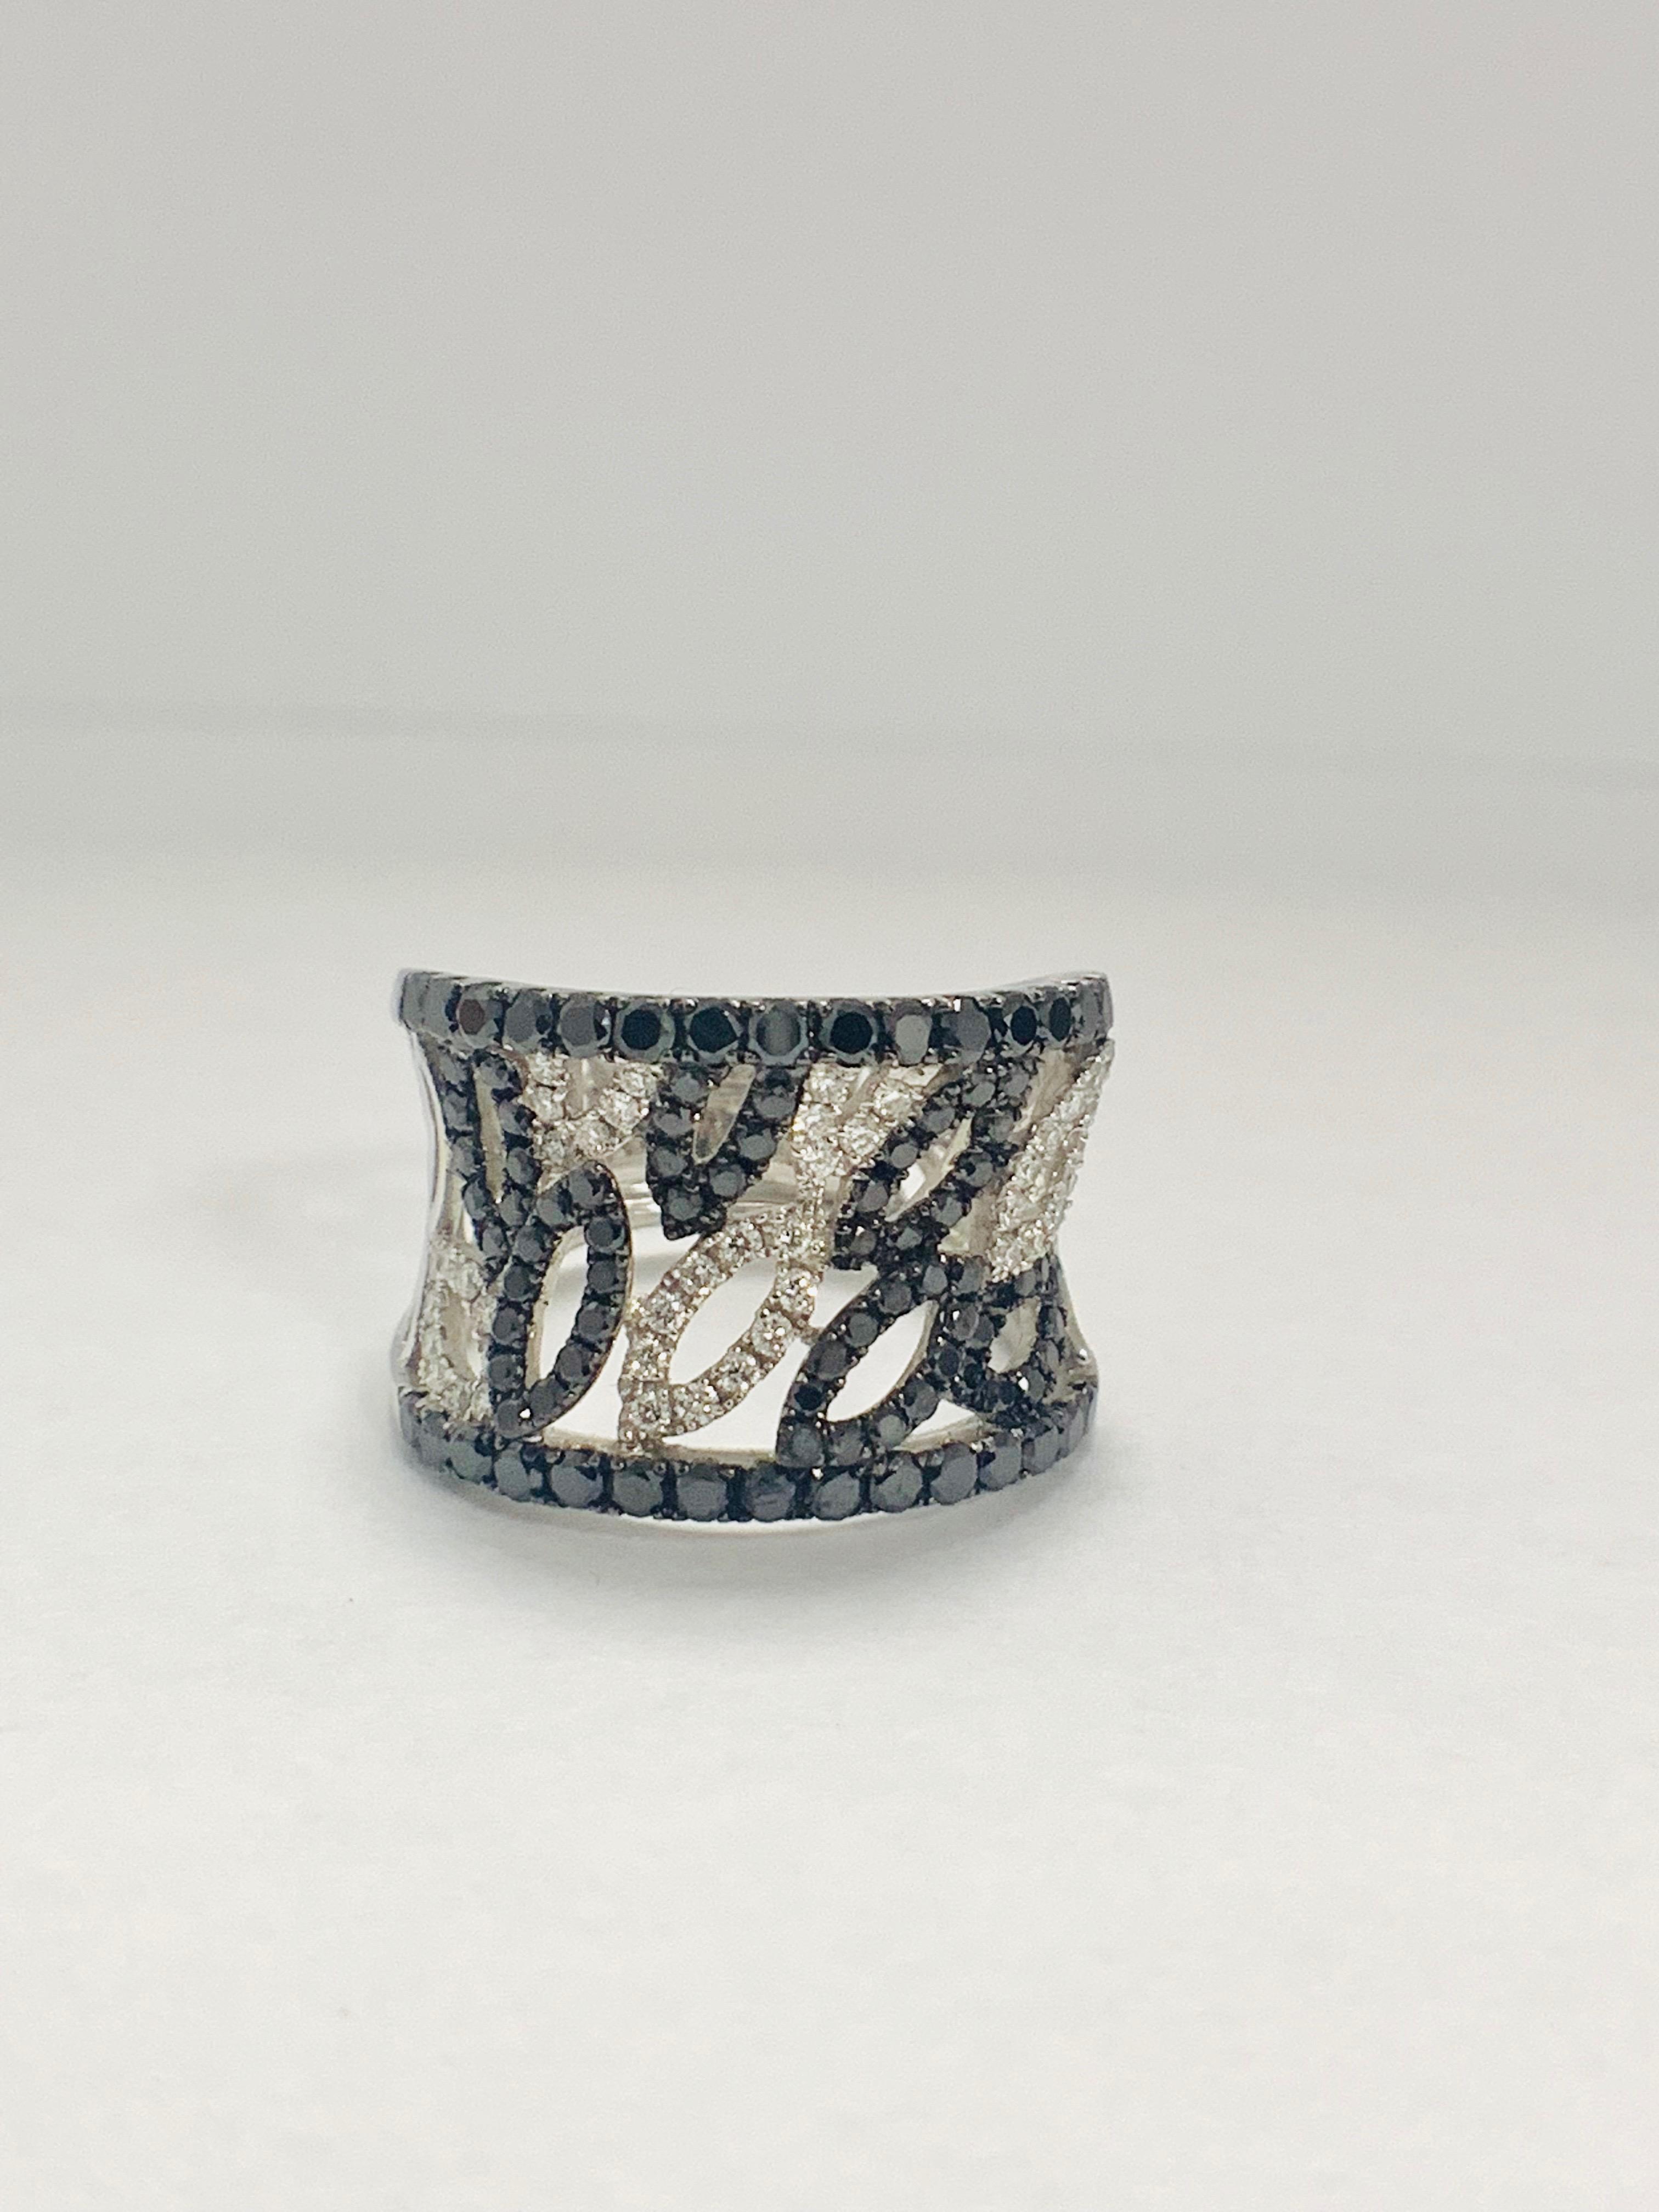 18ct White Gold Diamond ring featuring 90 round cut, black Diamonds (1.14ct TBDW)